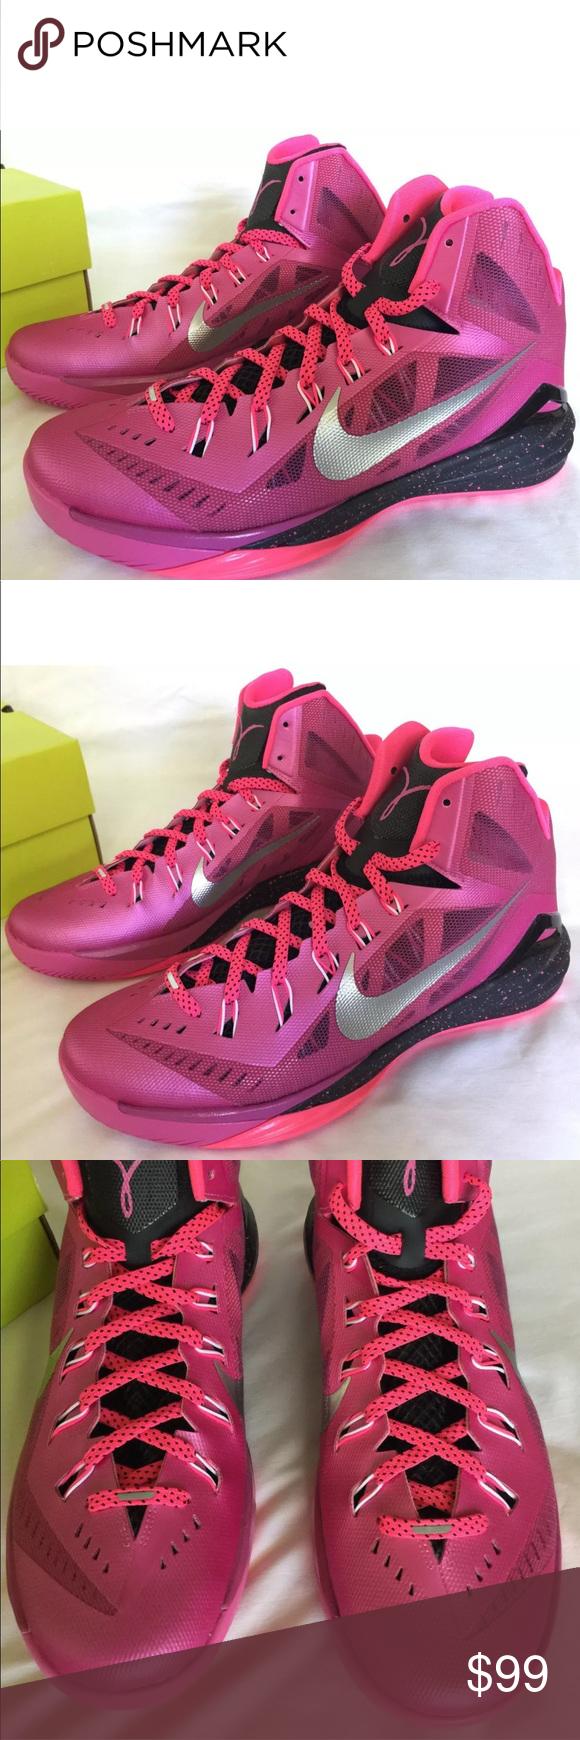 buy popular eab76 b87c1 brand new Nike Hyperdunk Pink Fire Basketball brand new Nike Hyperdunk 2014  653640-608 BCA Pink Fire Basketball Shoes Men s Size 9.5 Breast Cancer  Awareness ...